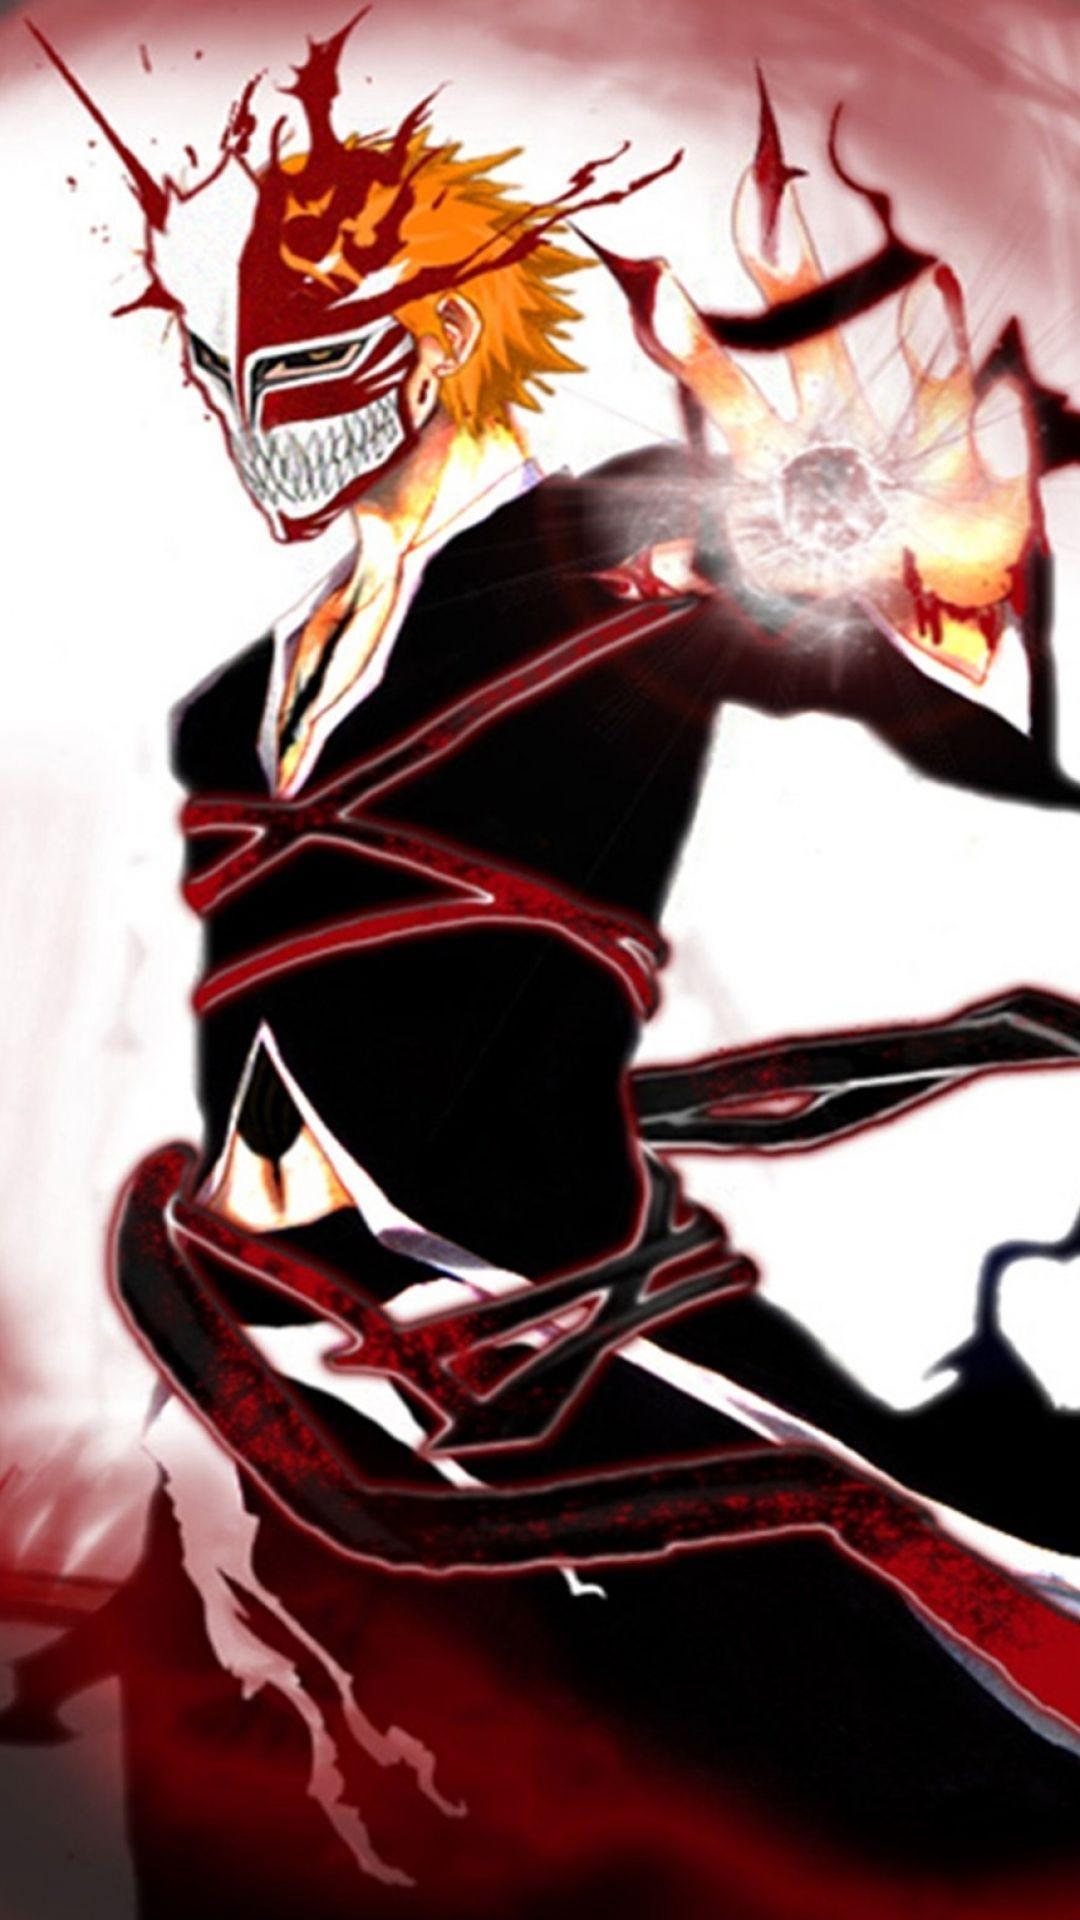 Bleach Wallpaper Iphone : bleach, wallpaper, iphone, 最高の壁紙:, 【最新】, Bleach, 壁紙, Iphone, Anime,, Anime, Ichigo,, Characters